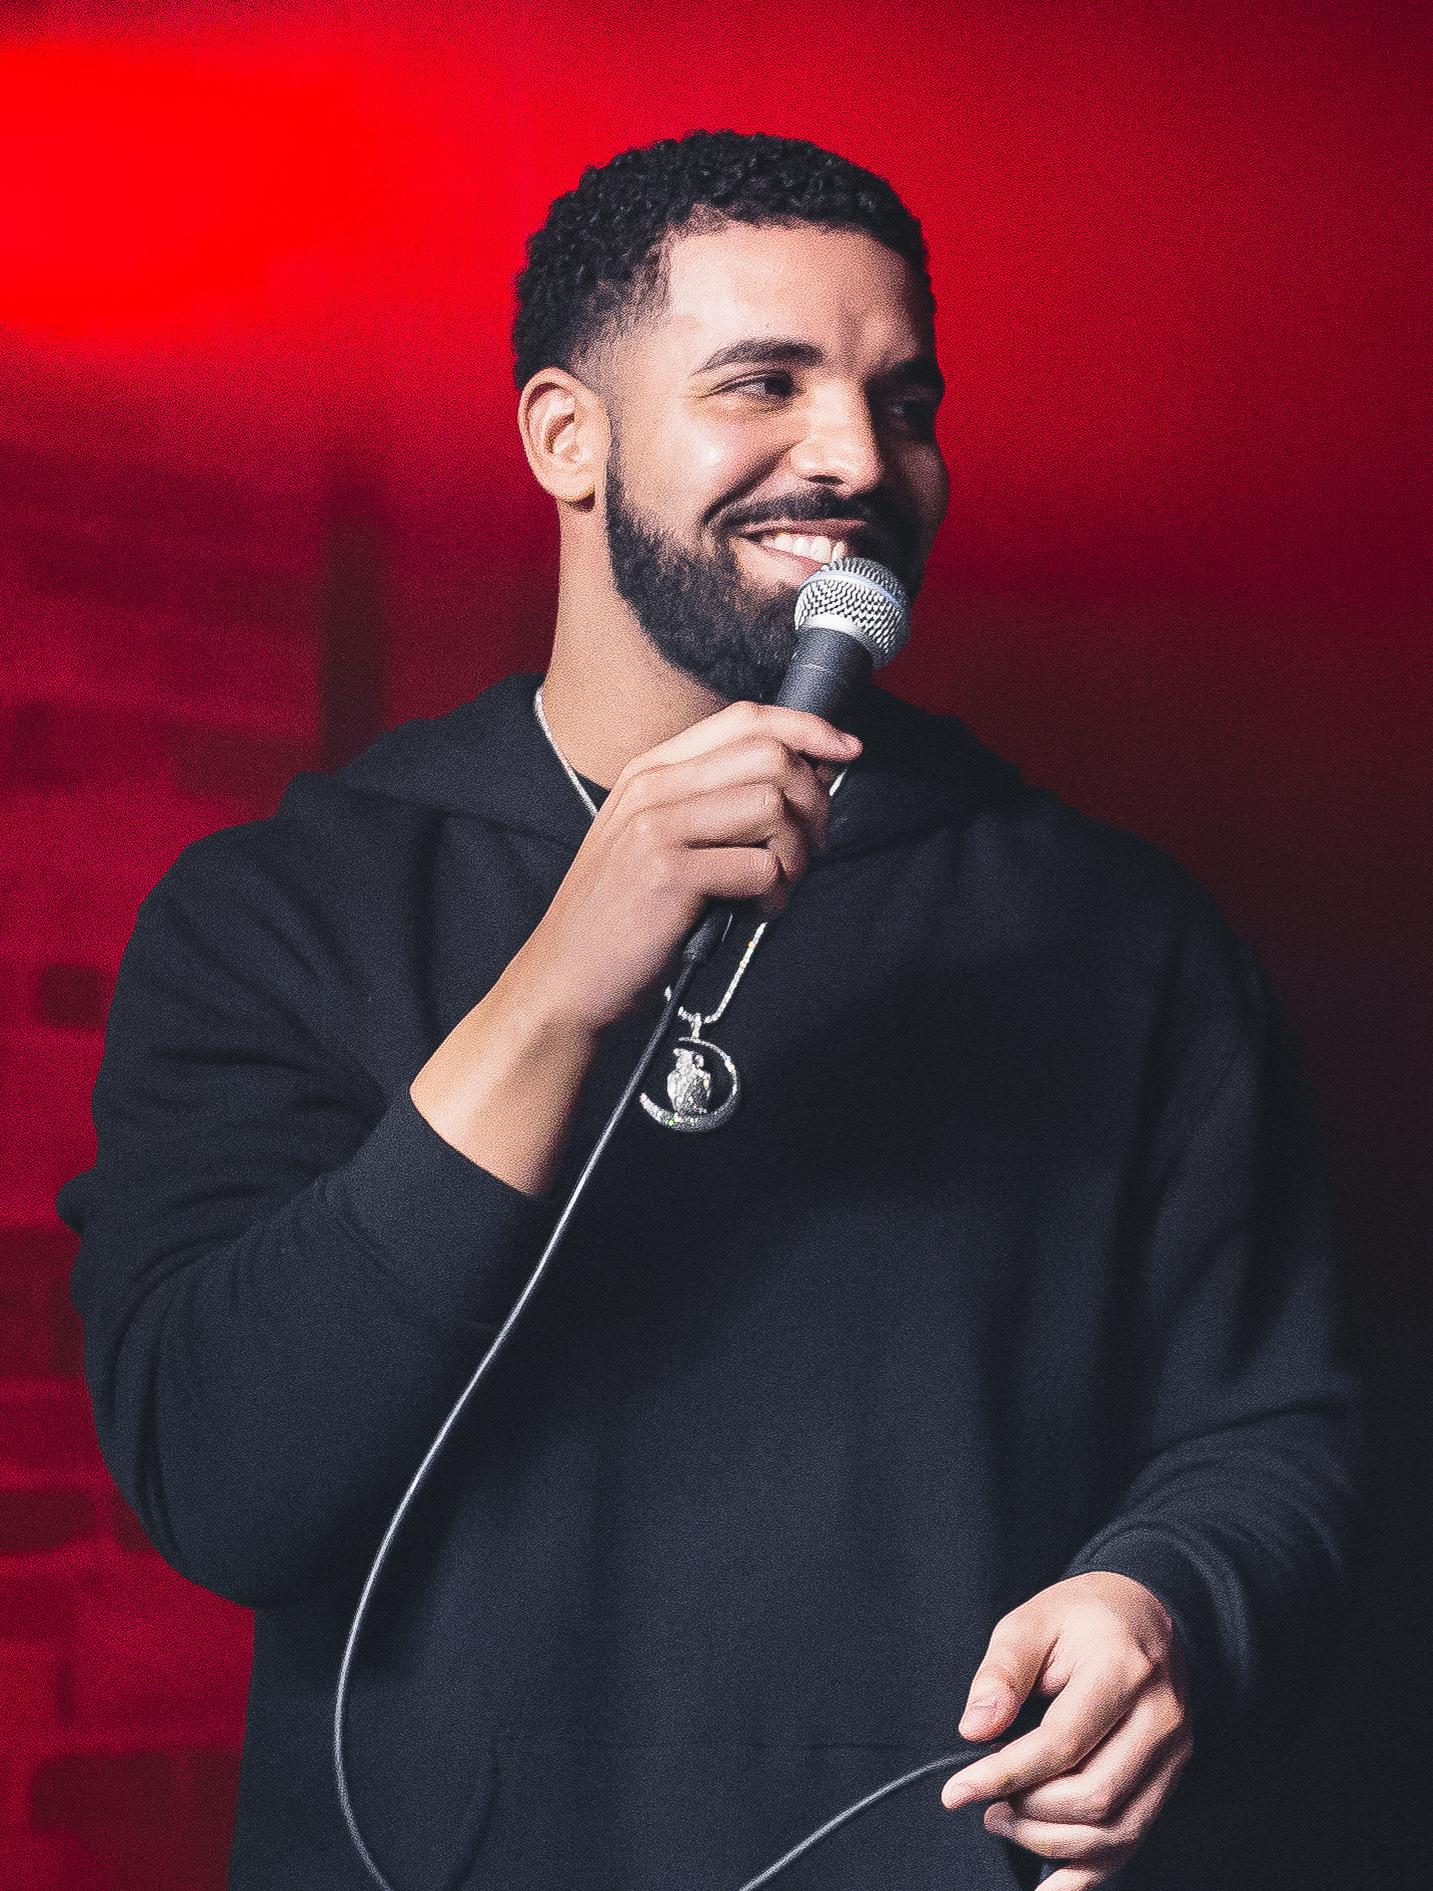 Platz 1: Drake